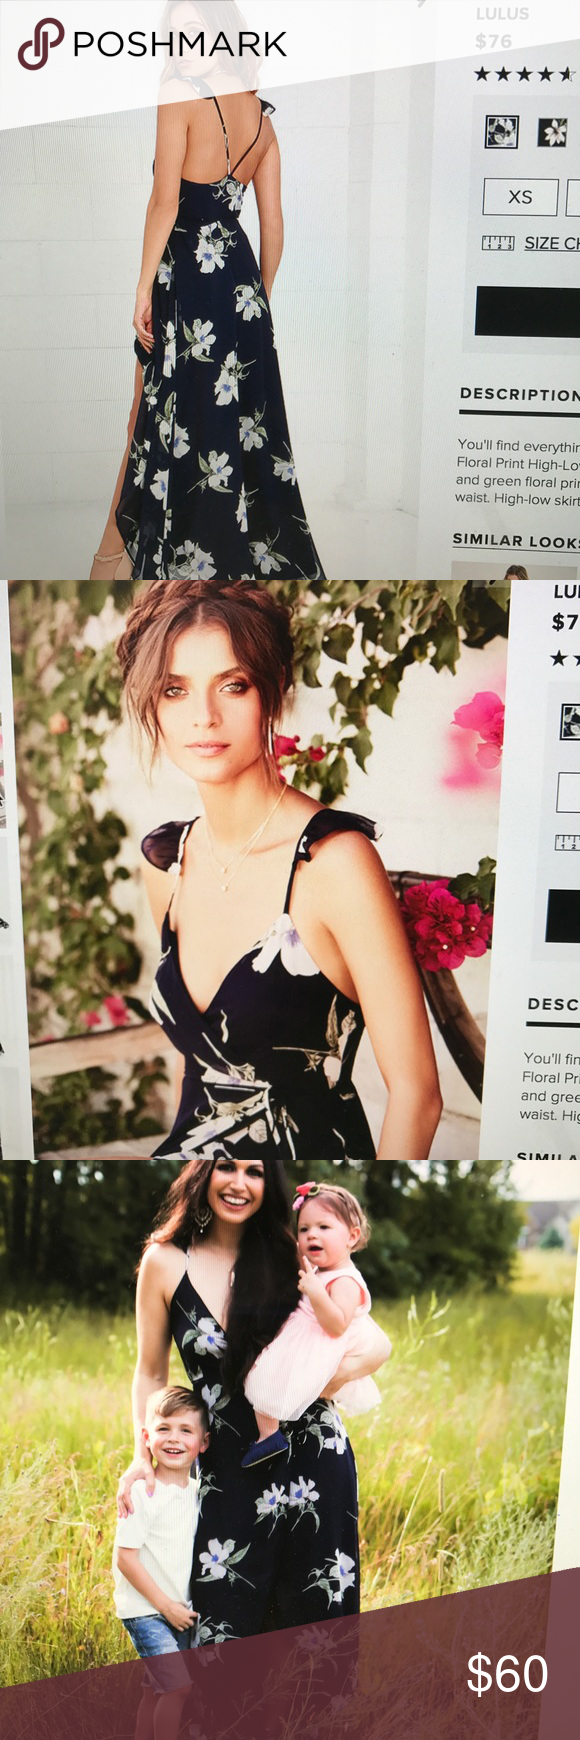 f108565d81 Lulus- All mine navy floral print wrap dress Worn once for 1 hr photos